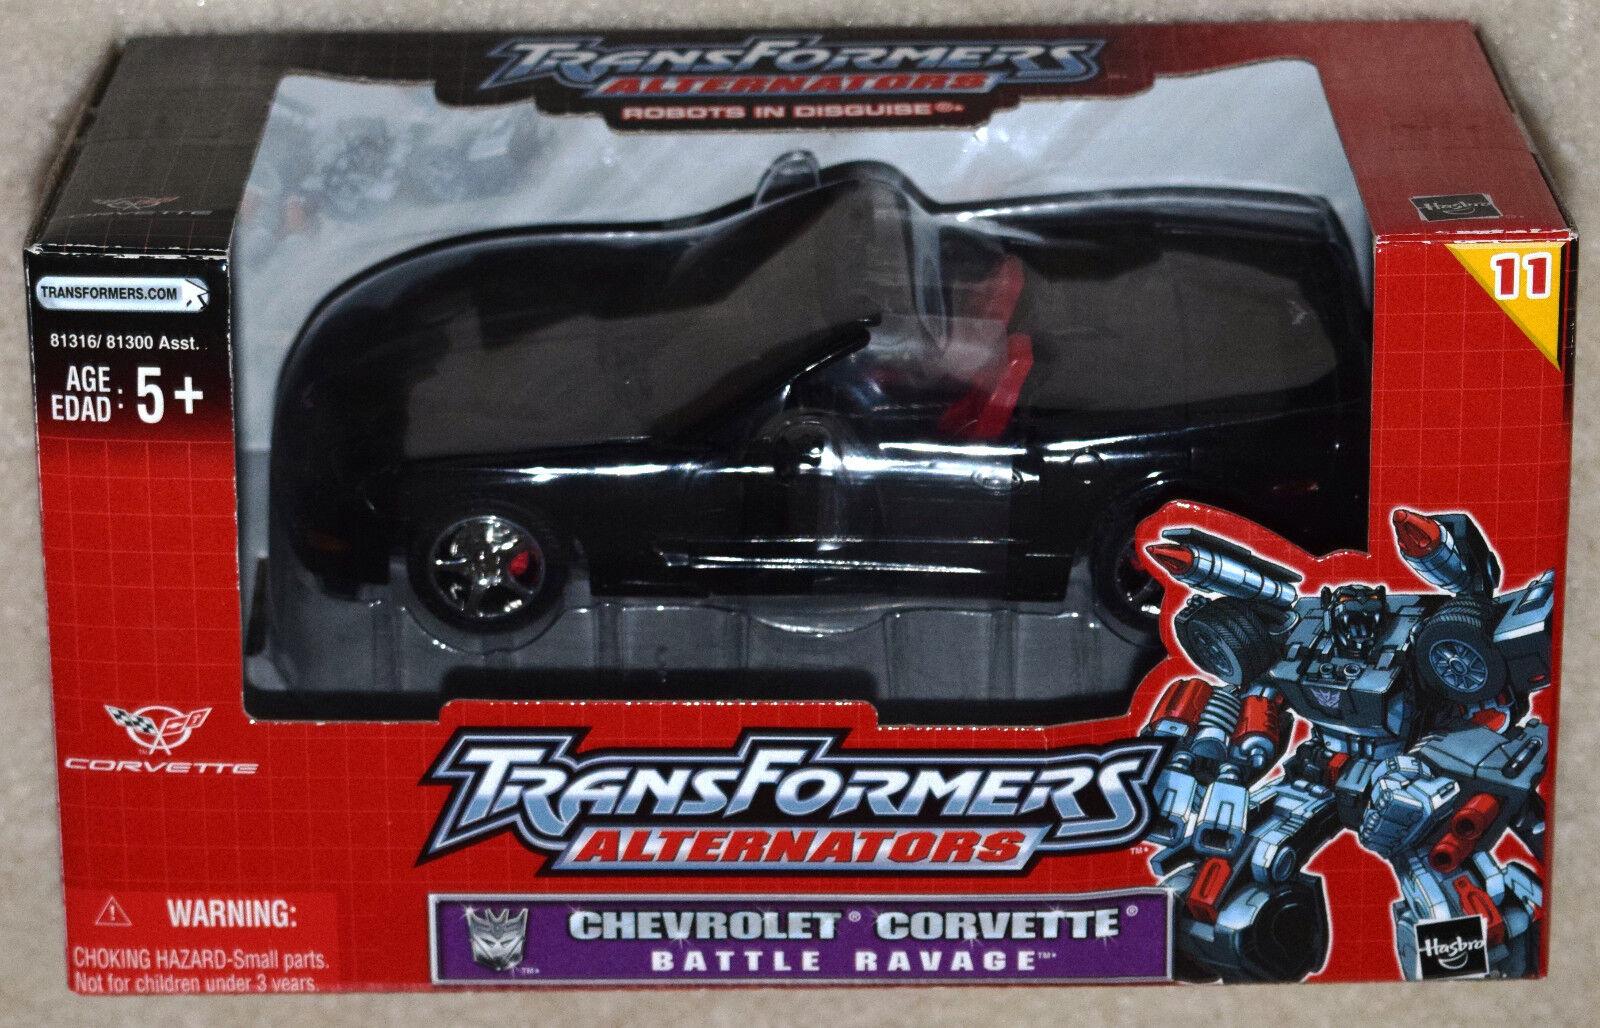 Hasbro Transformers Alternators Chevrolet Corvette Battle Ravage Figure (MIOB)